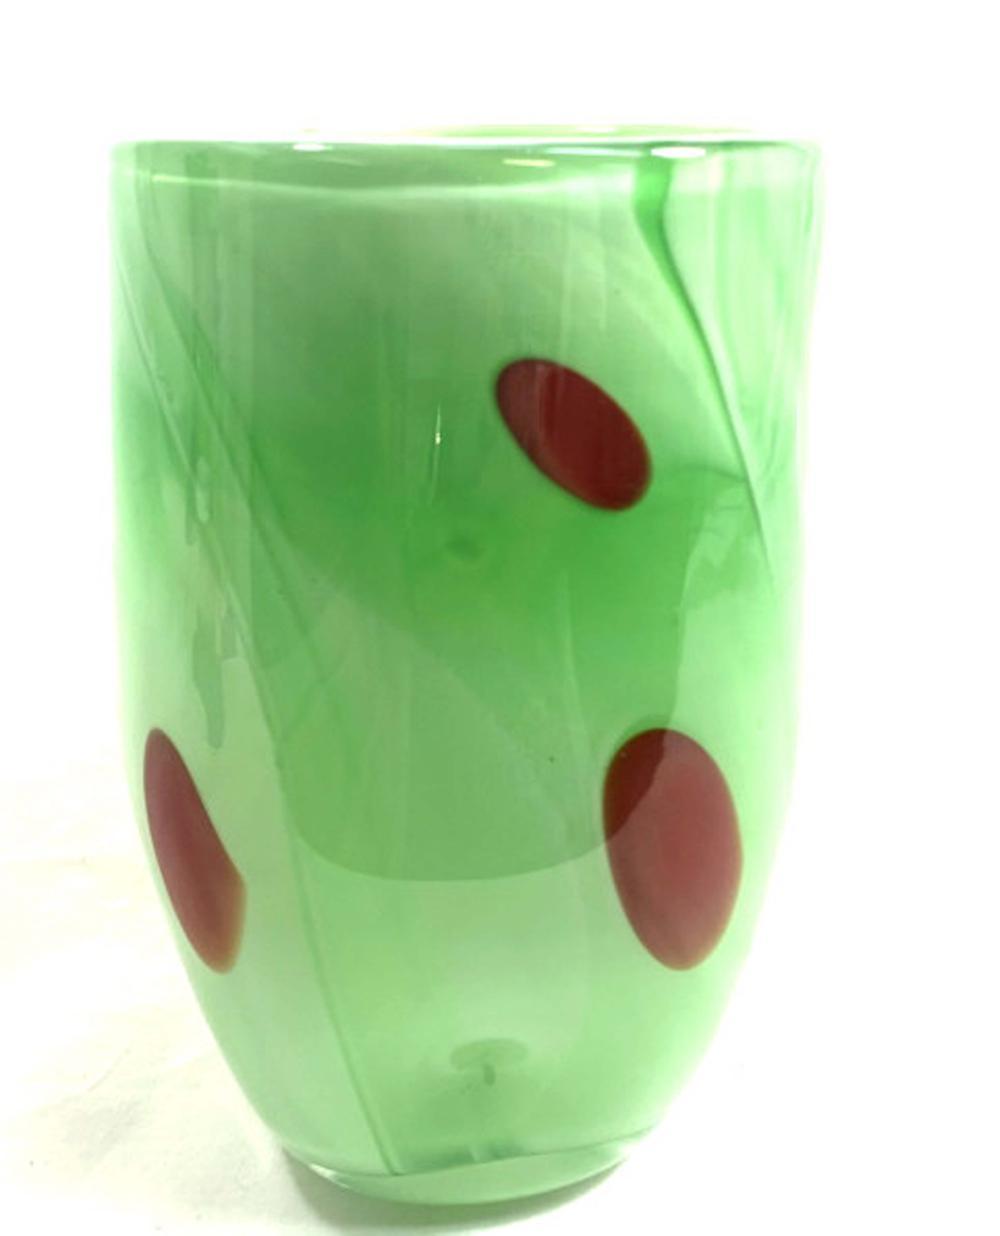 SUPERB GREEN GLASS/RED SPOT ART GLASS VASE